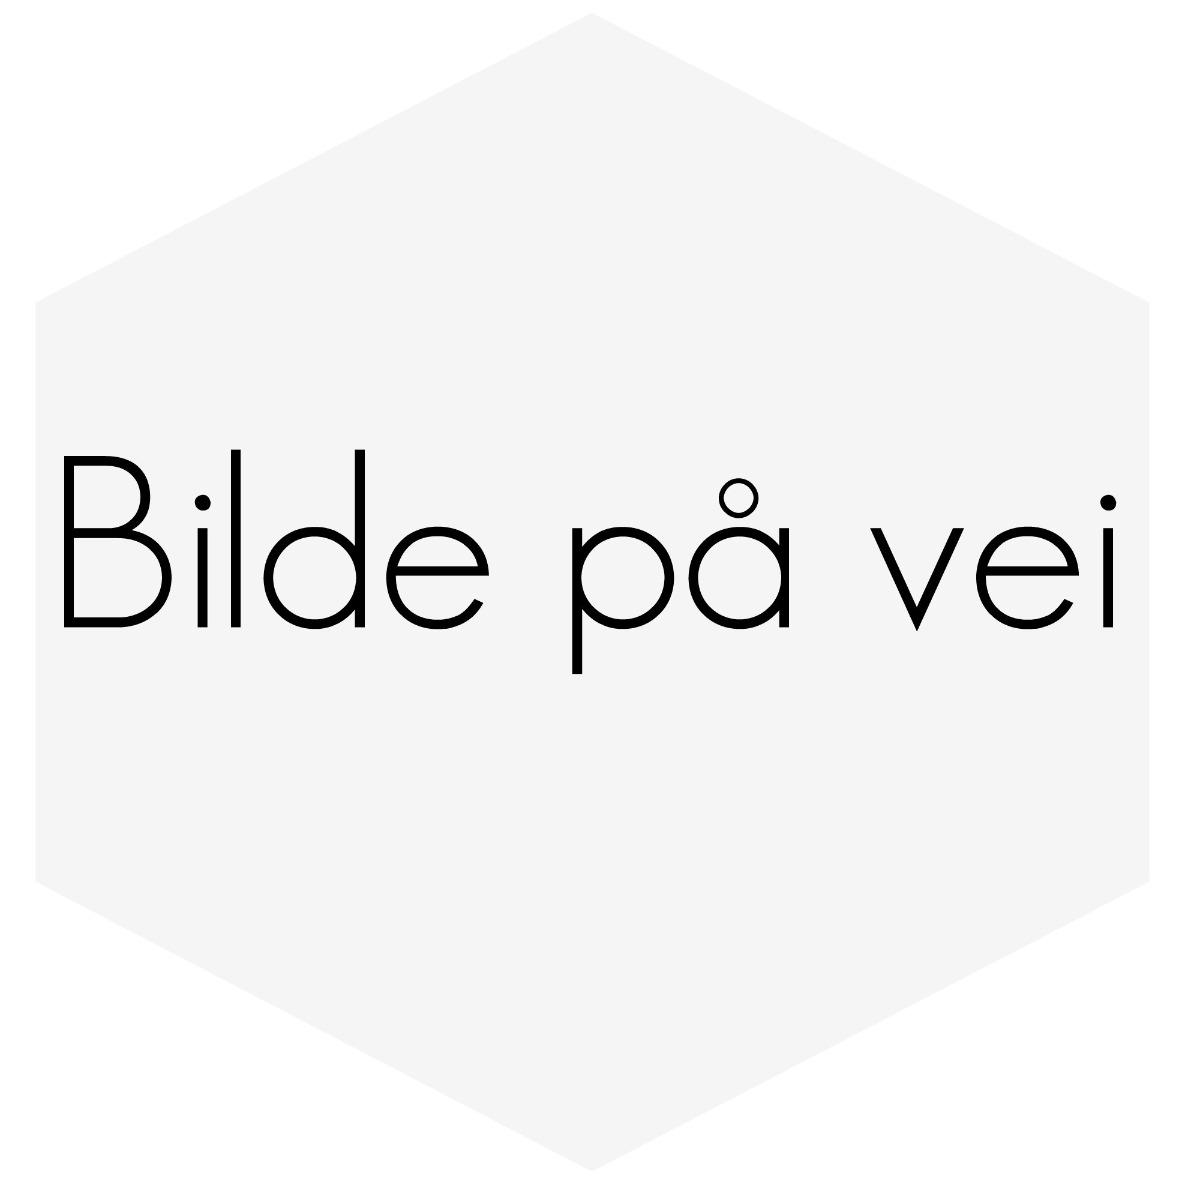 INSTRUMENT PROSPORT-S 60MM VACUM MÅLER MED LYDVARSLING